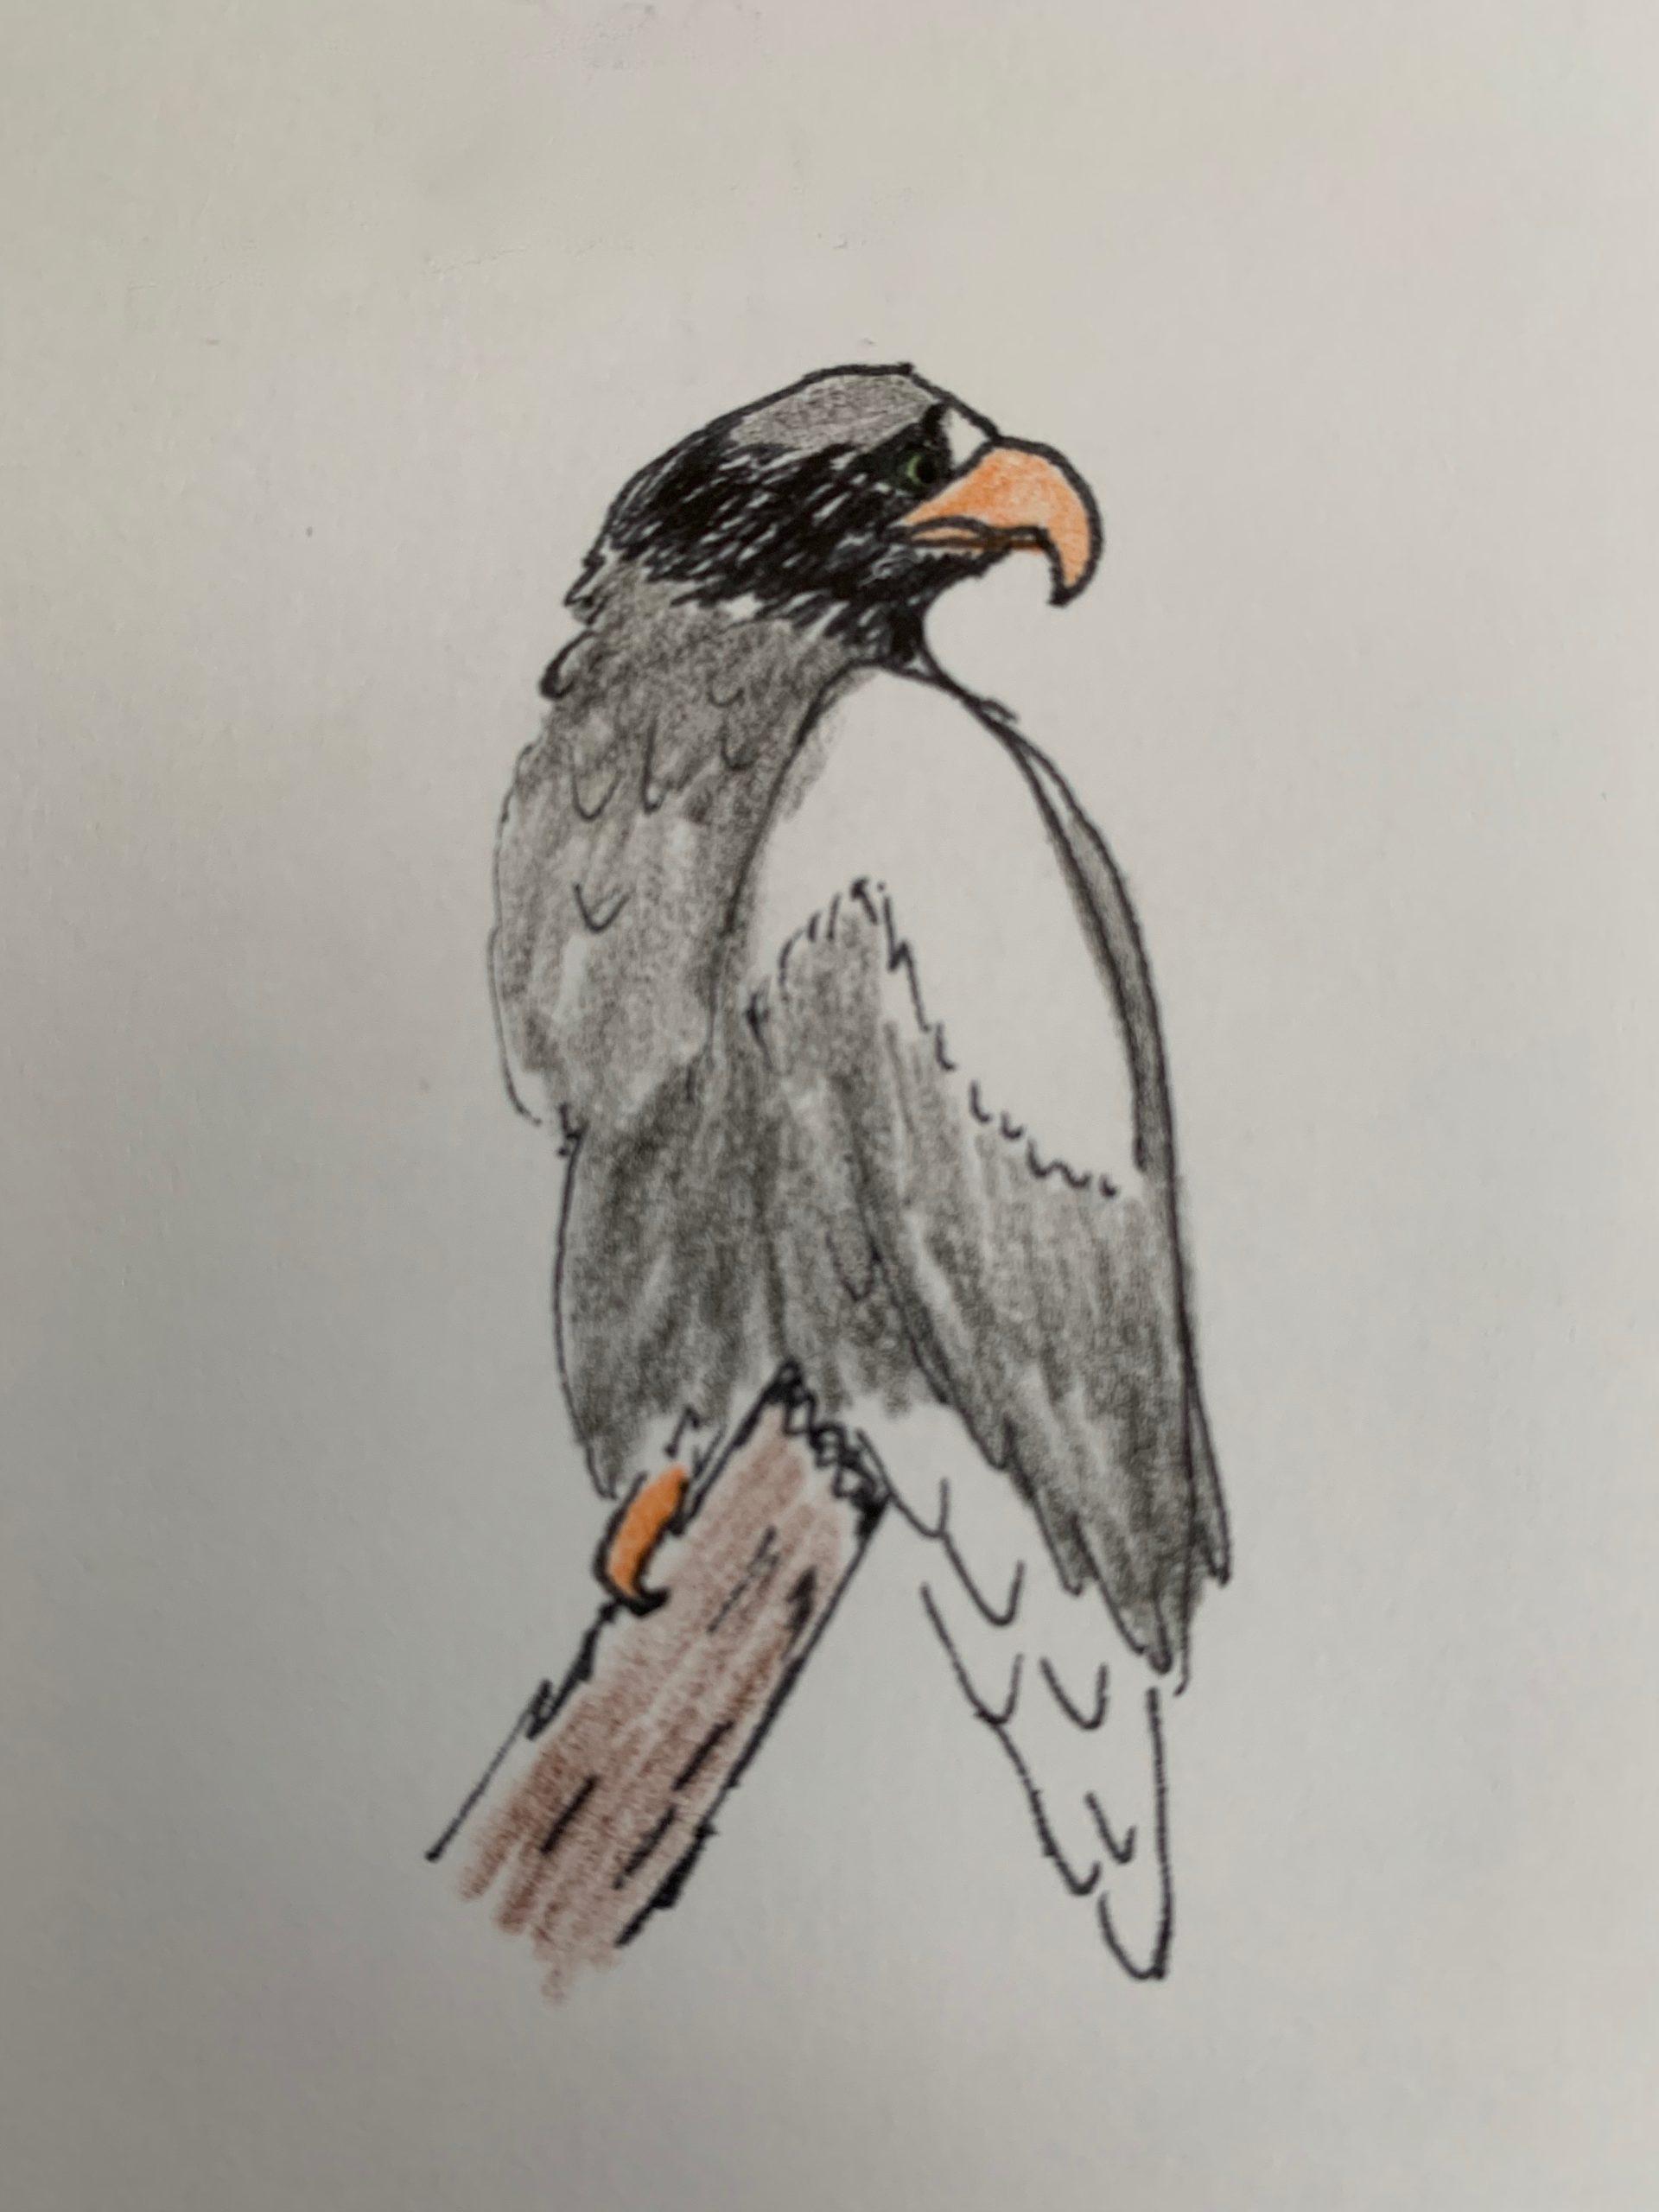 sea bird eagle hand drawn illustration pirate party seaport games, J D Stark